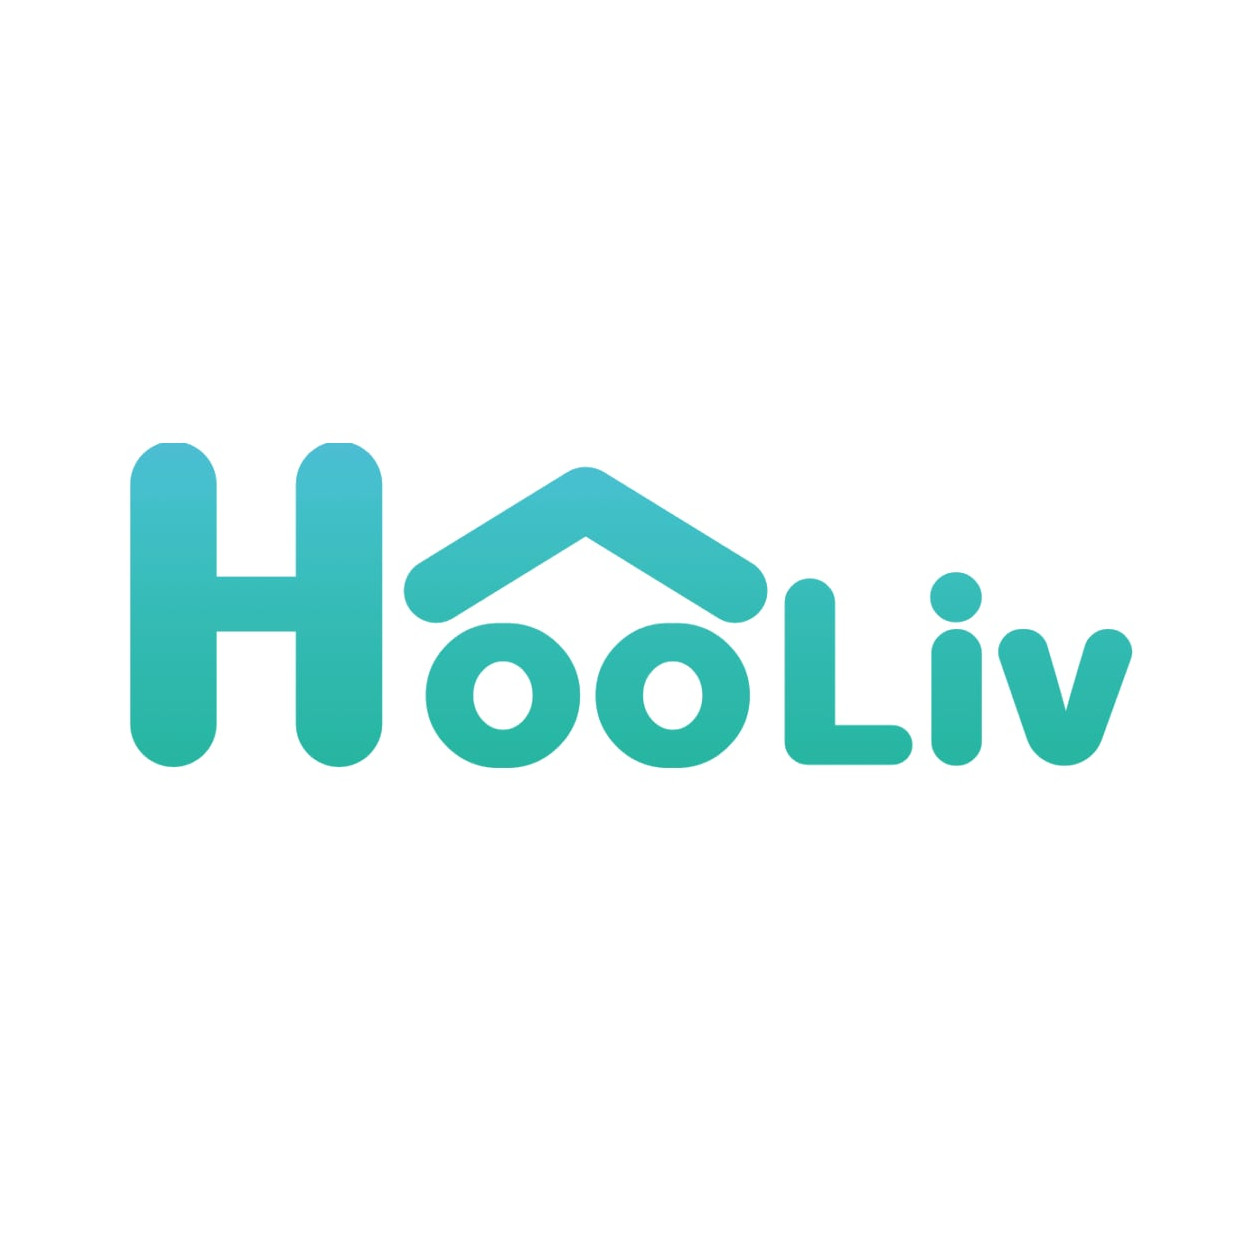 Hooliv Coliving Company